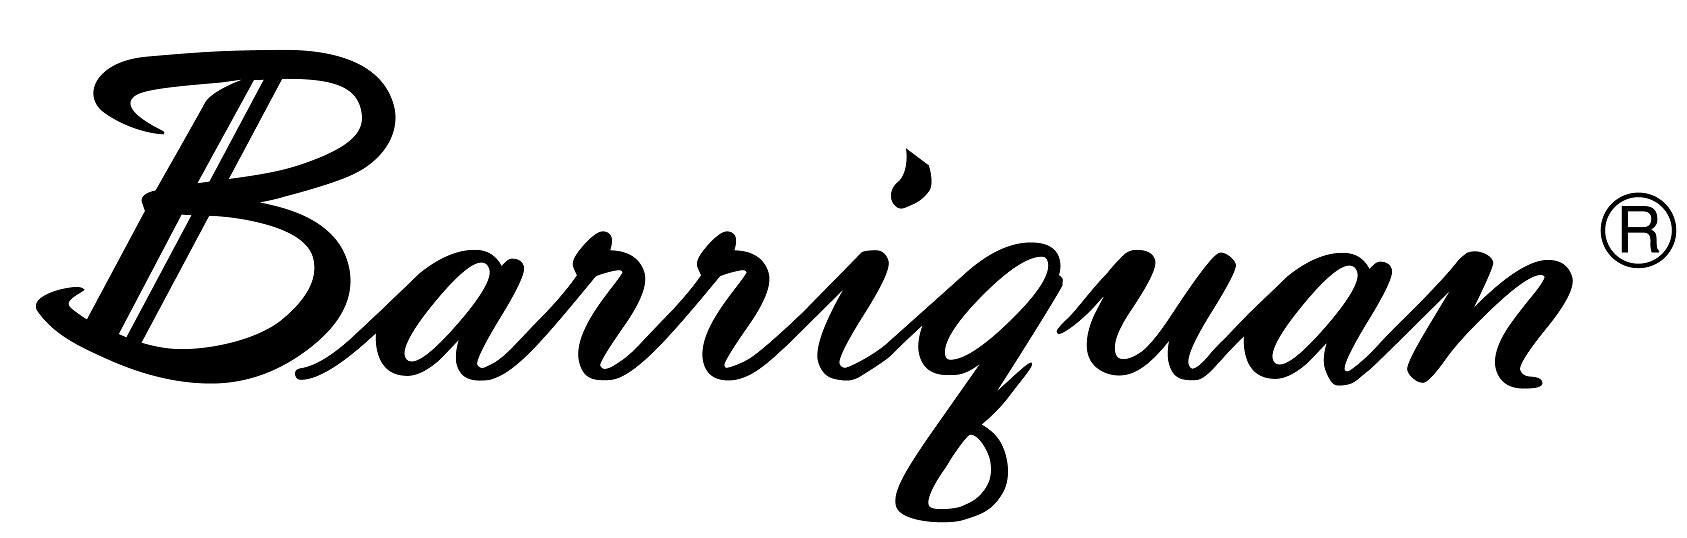 Sugino Barriquan Logo